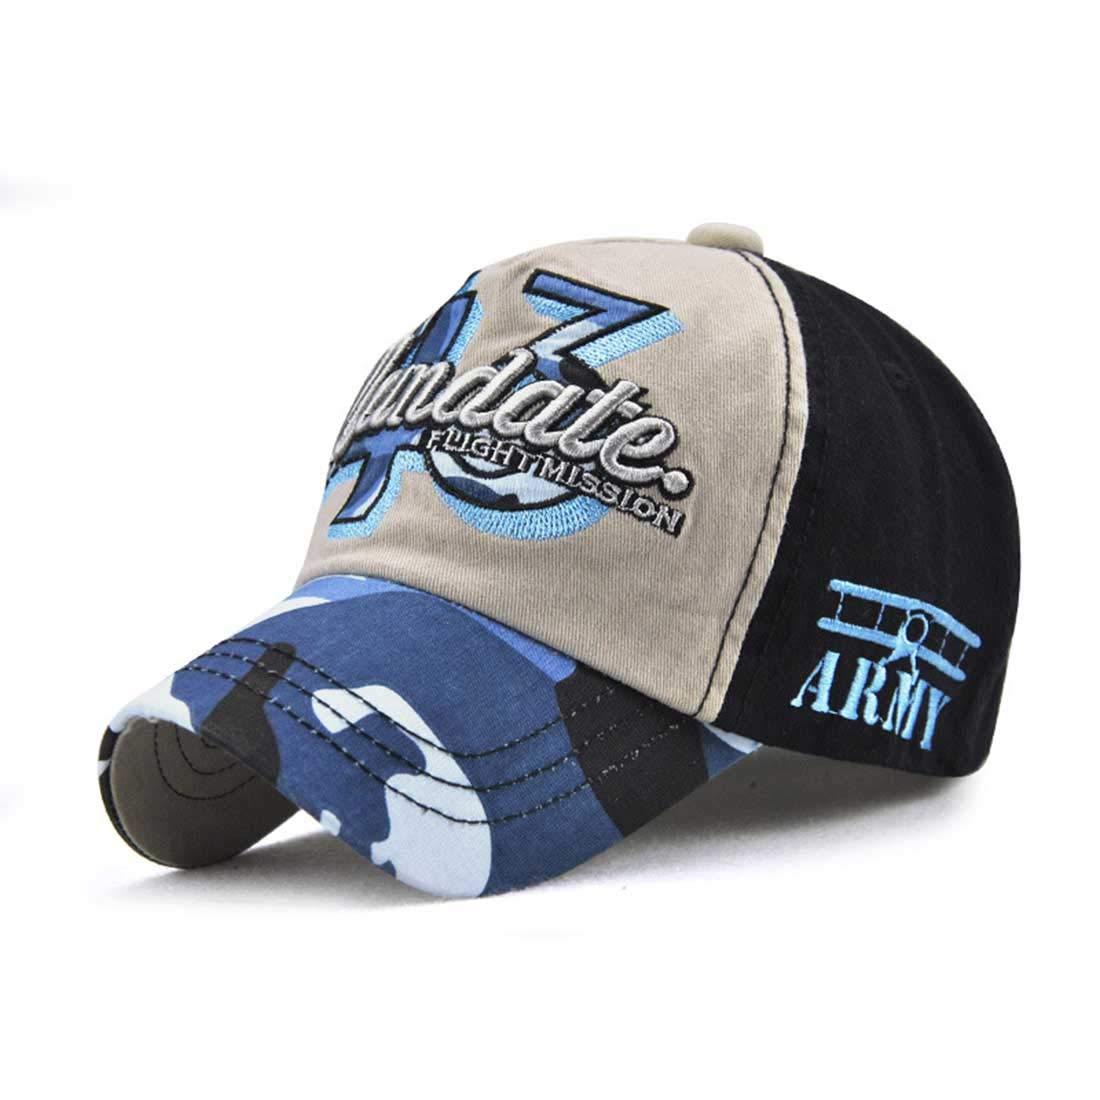 King Star Kids Boy Baseball Hat Cute Letter Embroidered Cotton Cap Black Grey